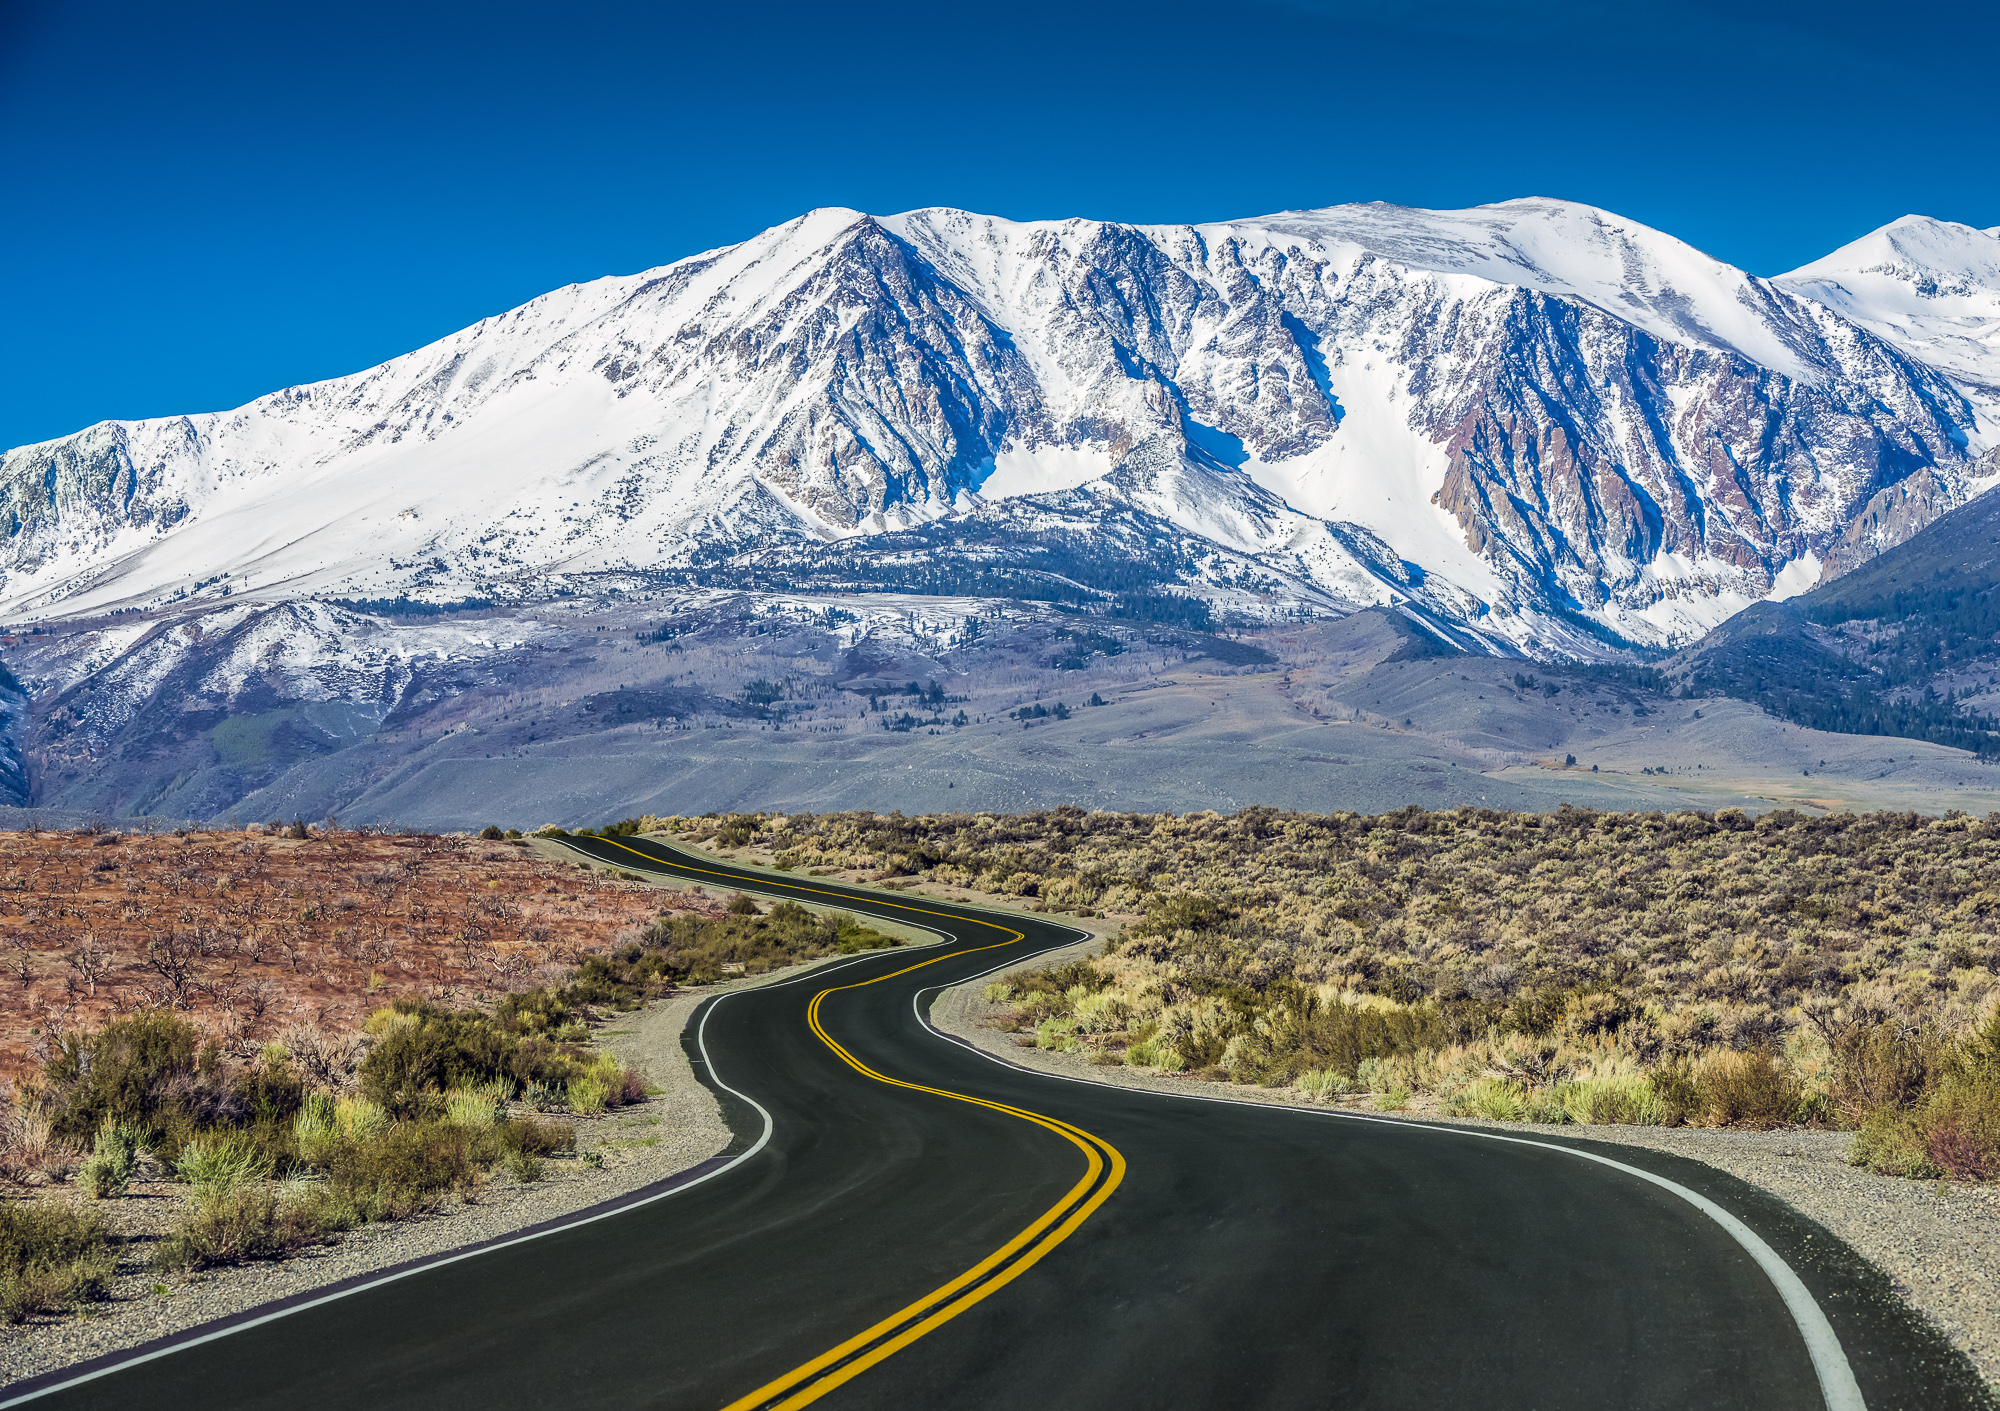 Winding Road Towards Mountains, Eastern Sierras, California, USA